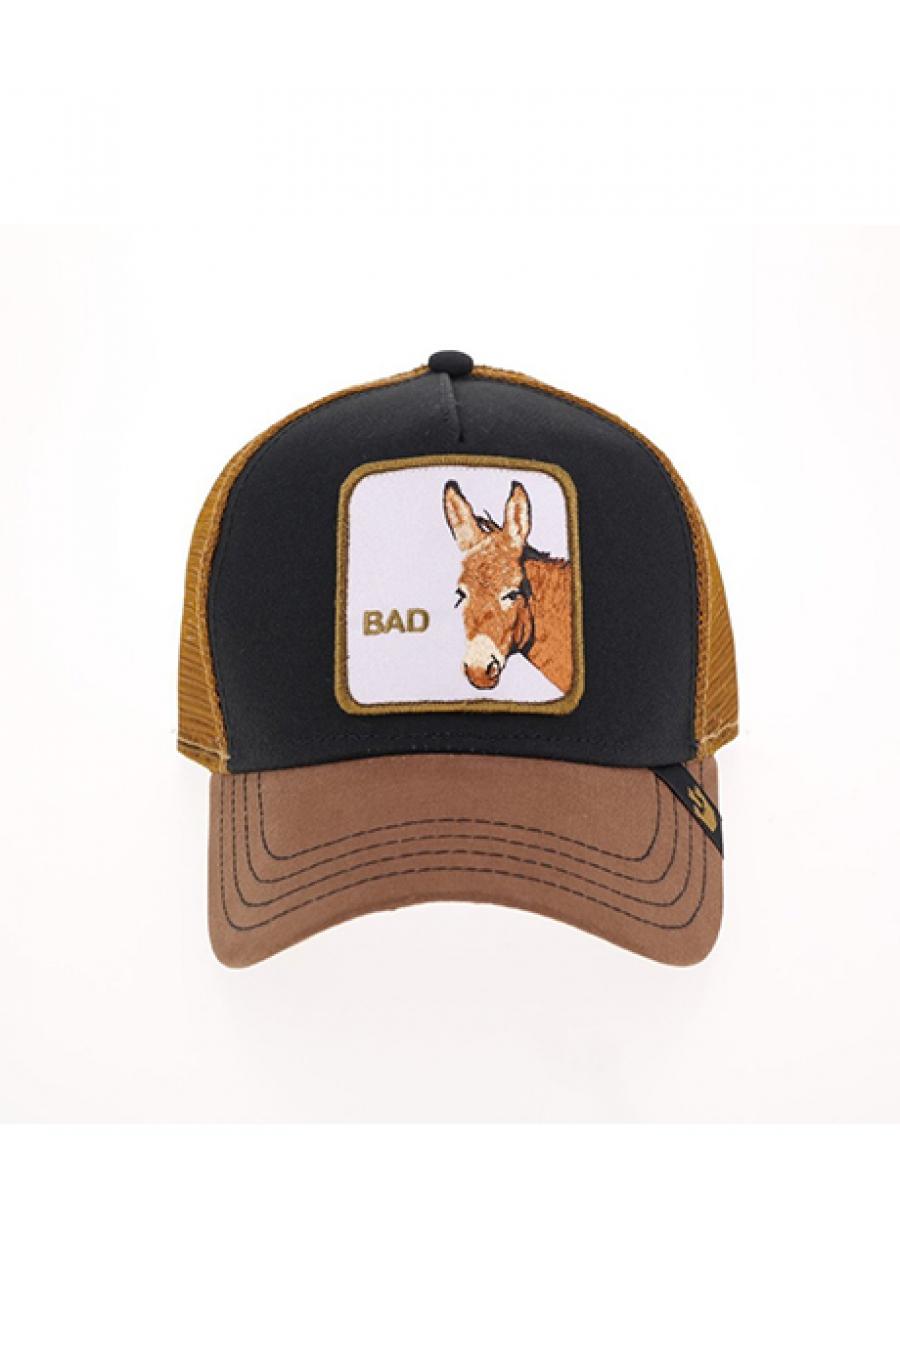 GOORIN BROS - Bad Ass Şapka